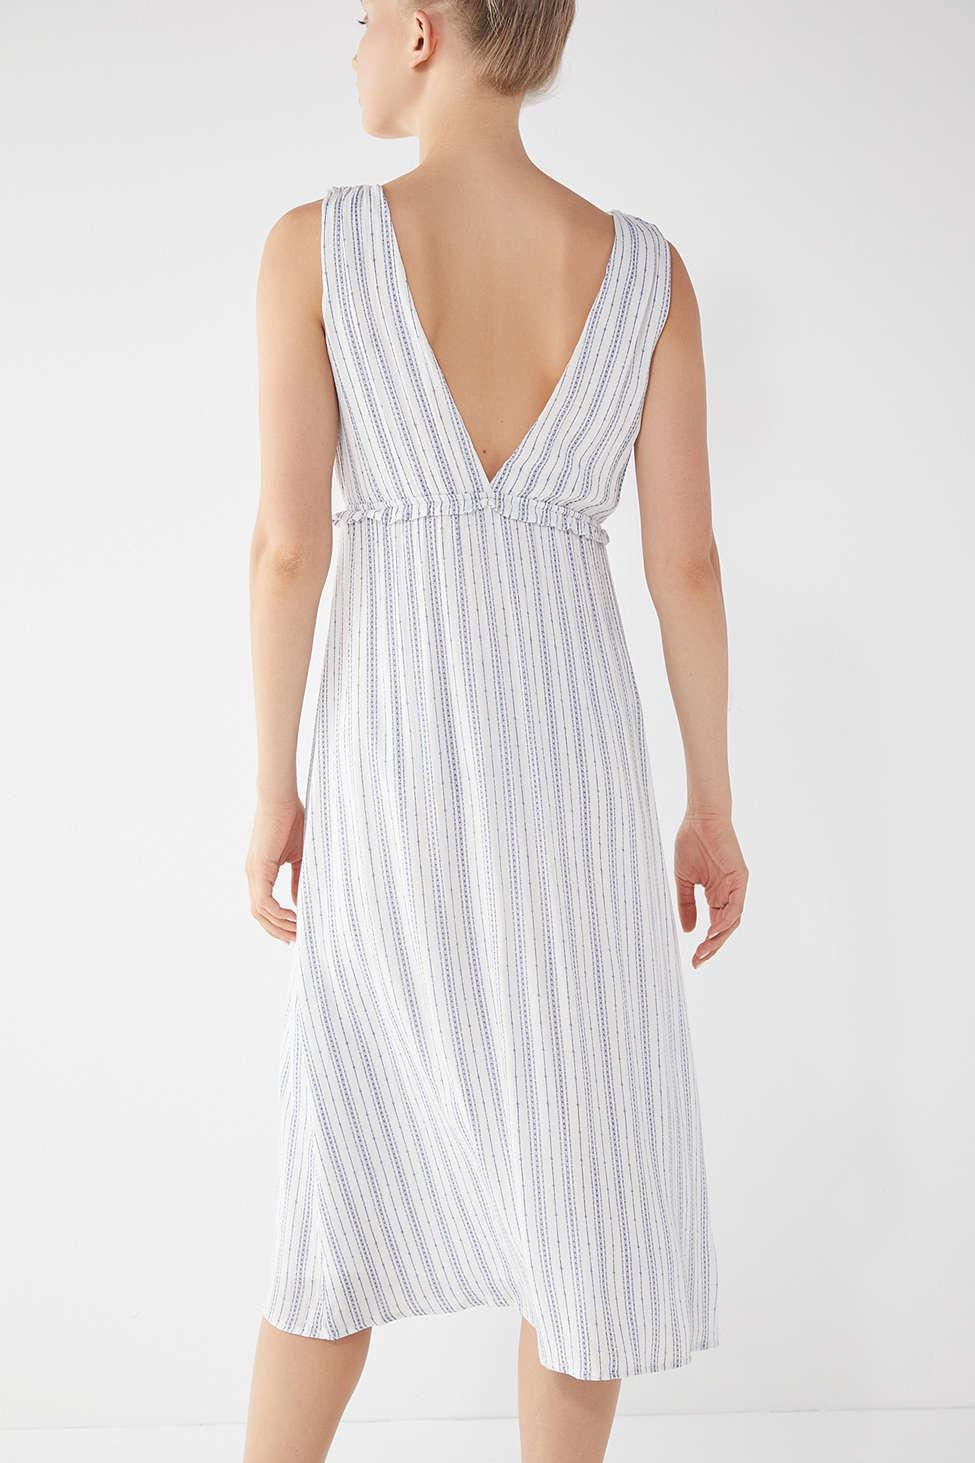 5494e8e74af48 Lyst - Urban Outfitters Uo Empire-waist Surplice Striped Midi Dress